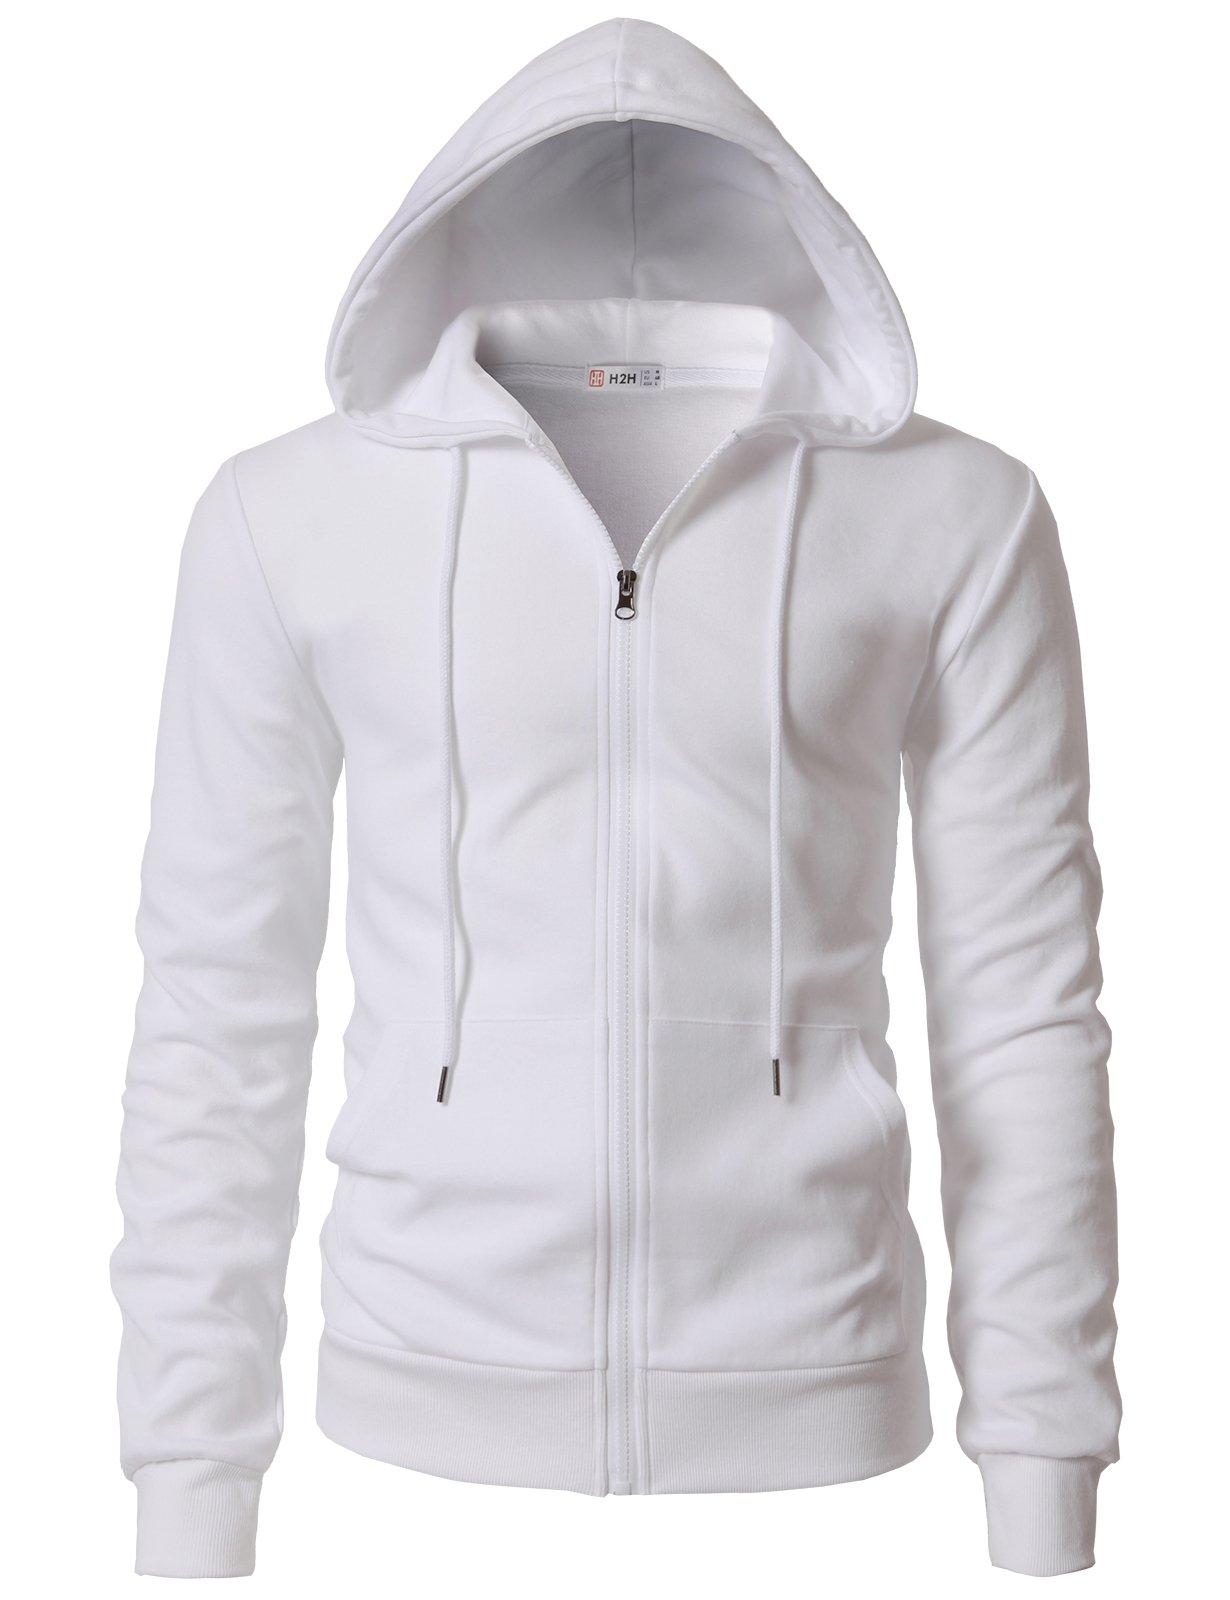 H2H Men's Zip Hoodie Fleece Full Zip Cotton Plain Hoodie Jackets White US L/Asia XL (KMOHOL0131)